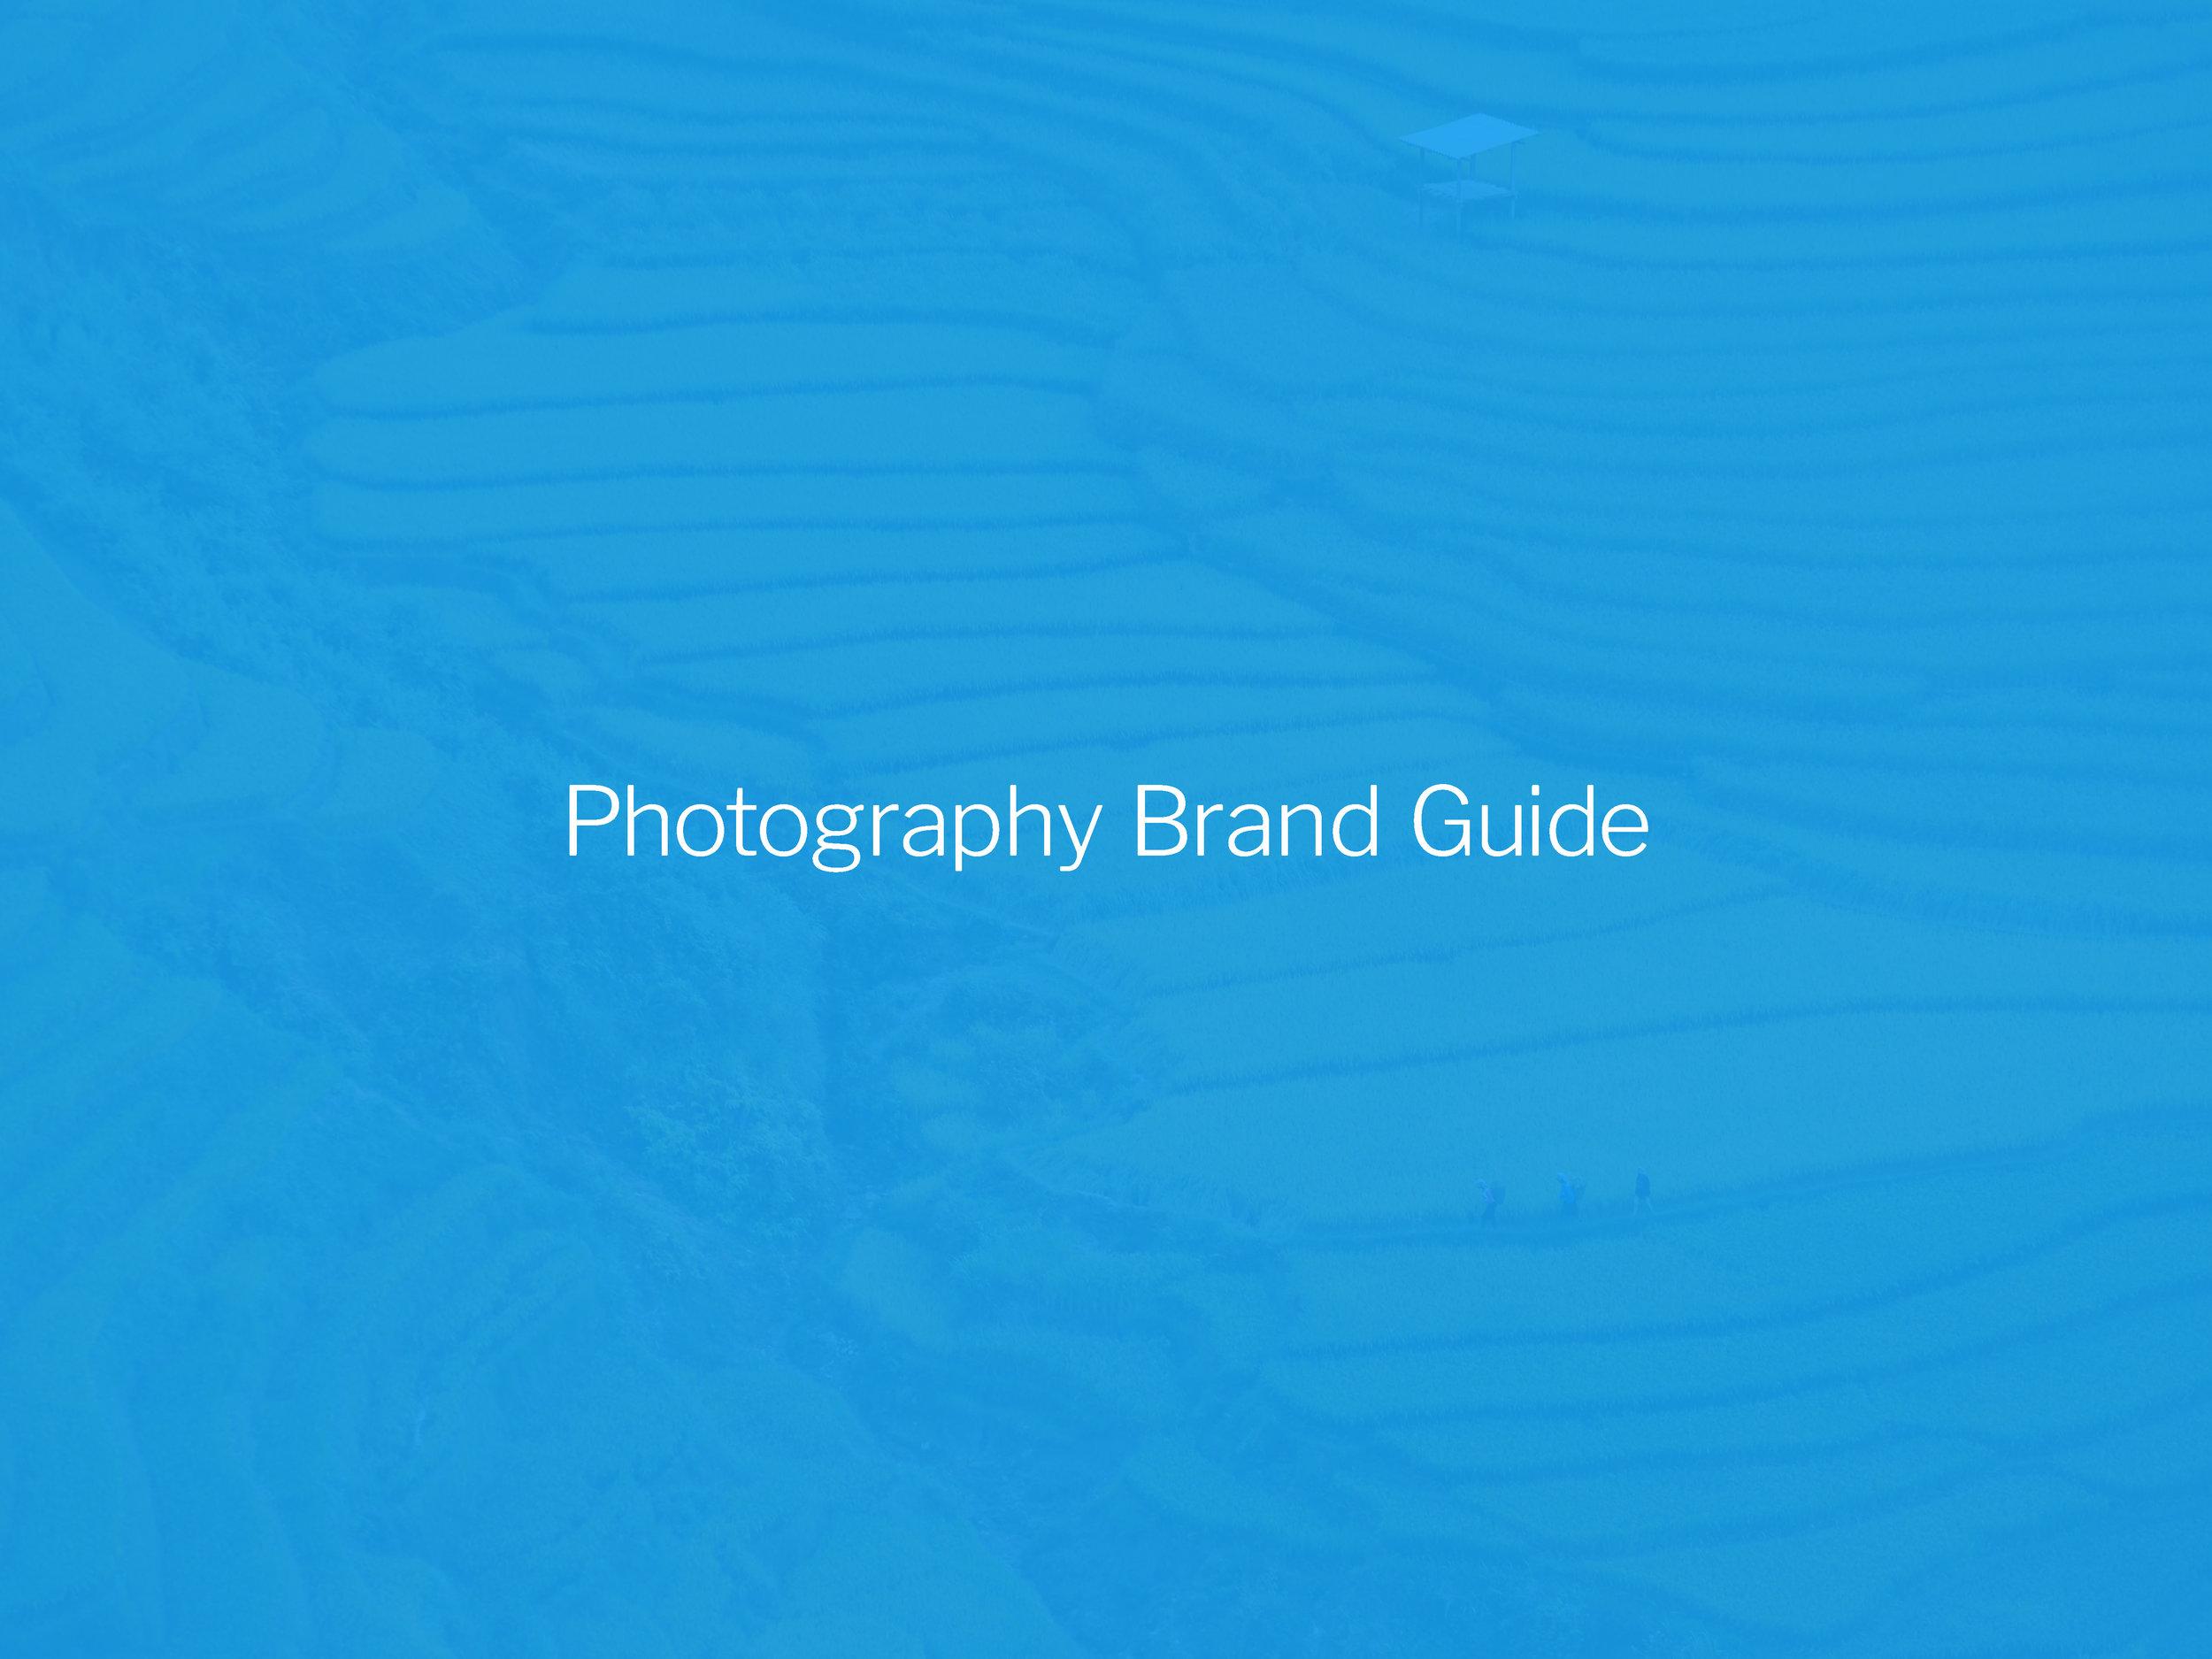 ciee_photobrandguide_Page_1.jpg